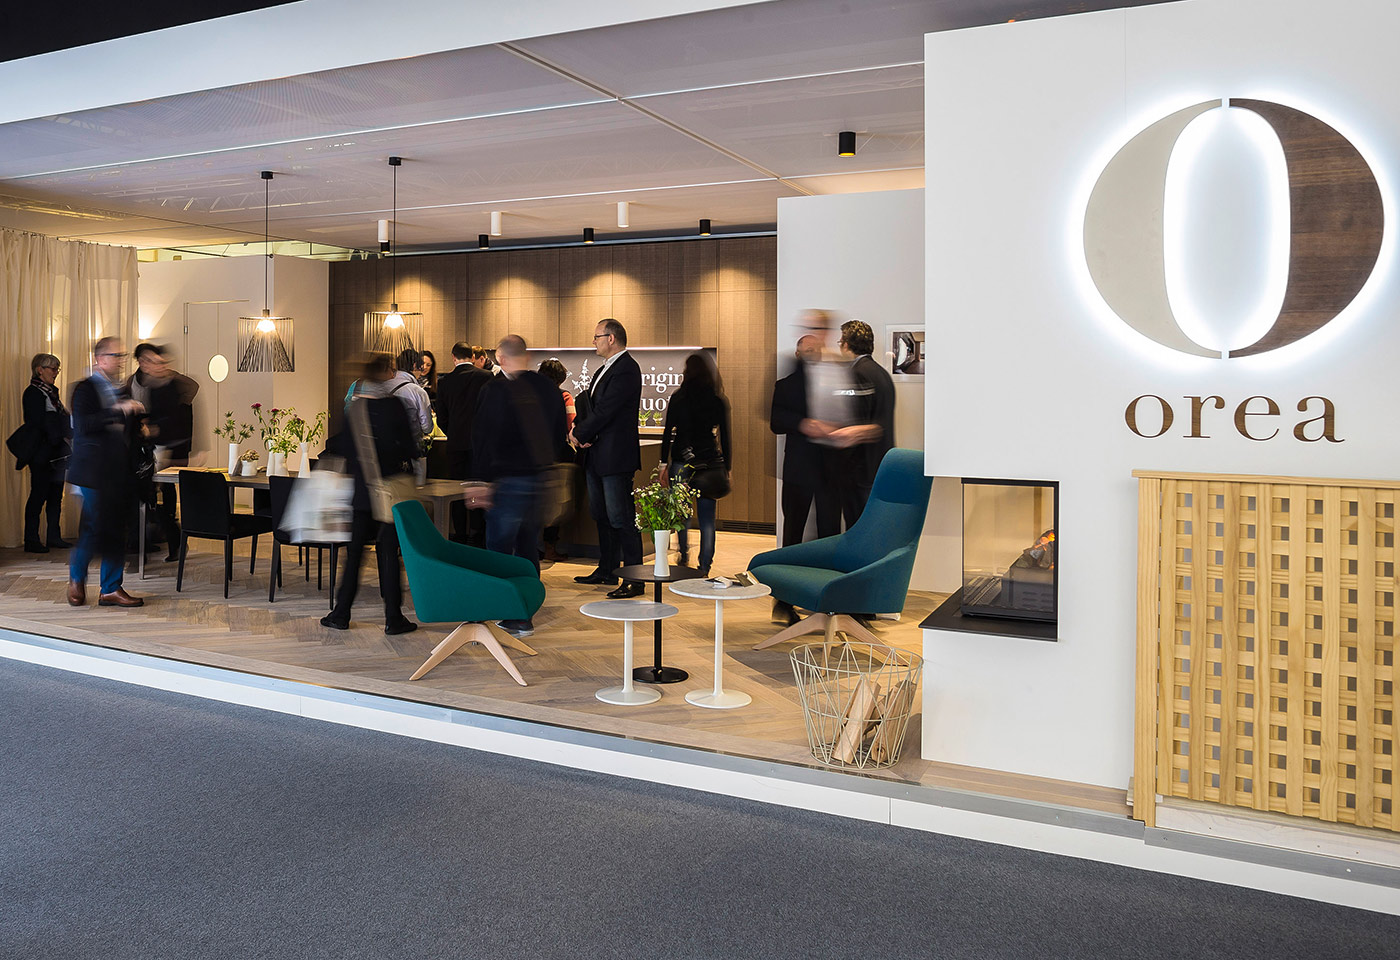 orea-swissbau-2016-4-stand.jpg